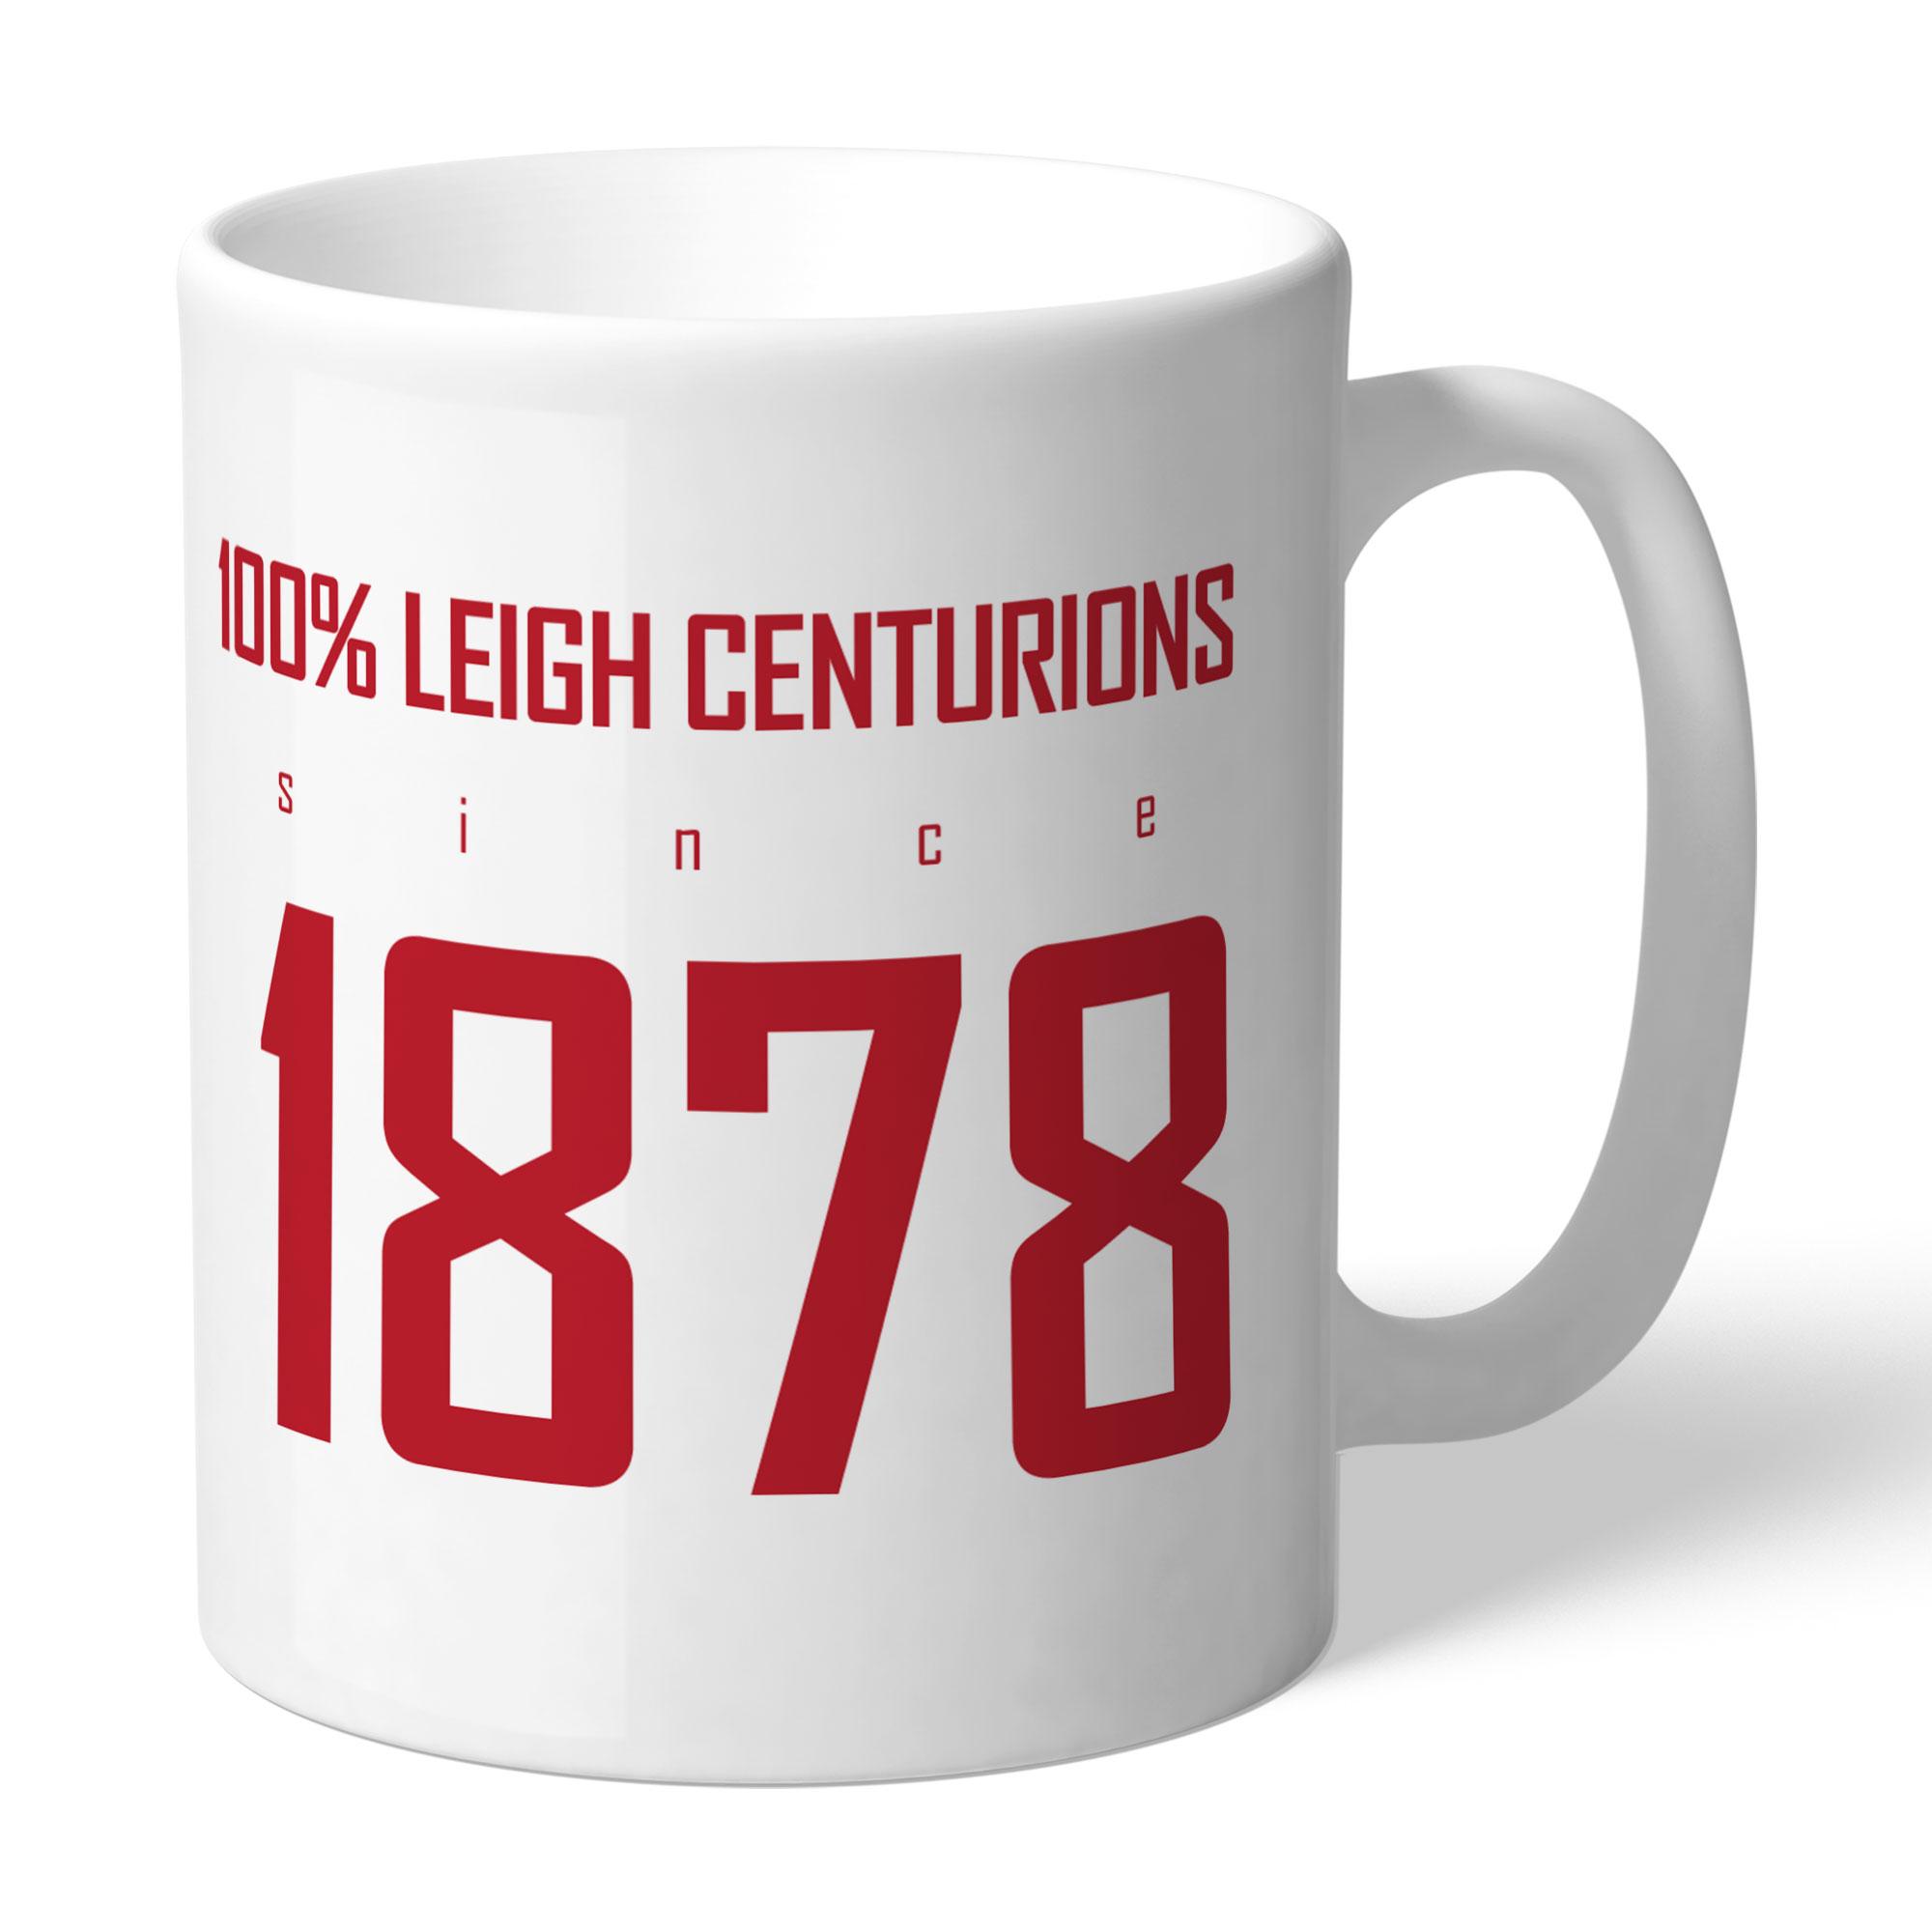 Leigh Centurions 100 Percent Mug